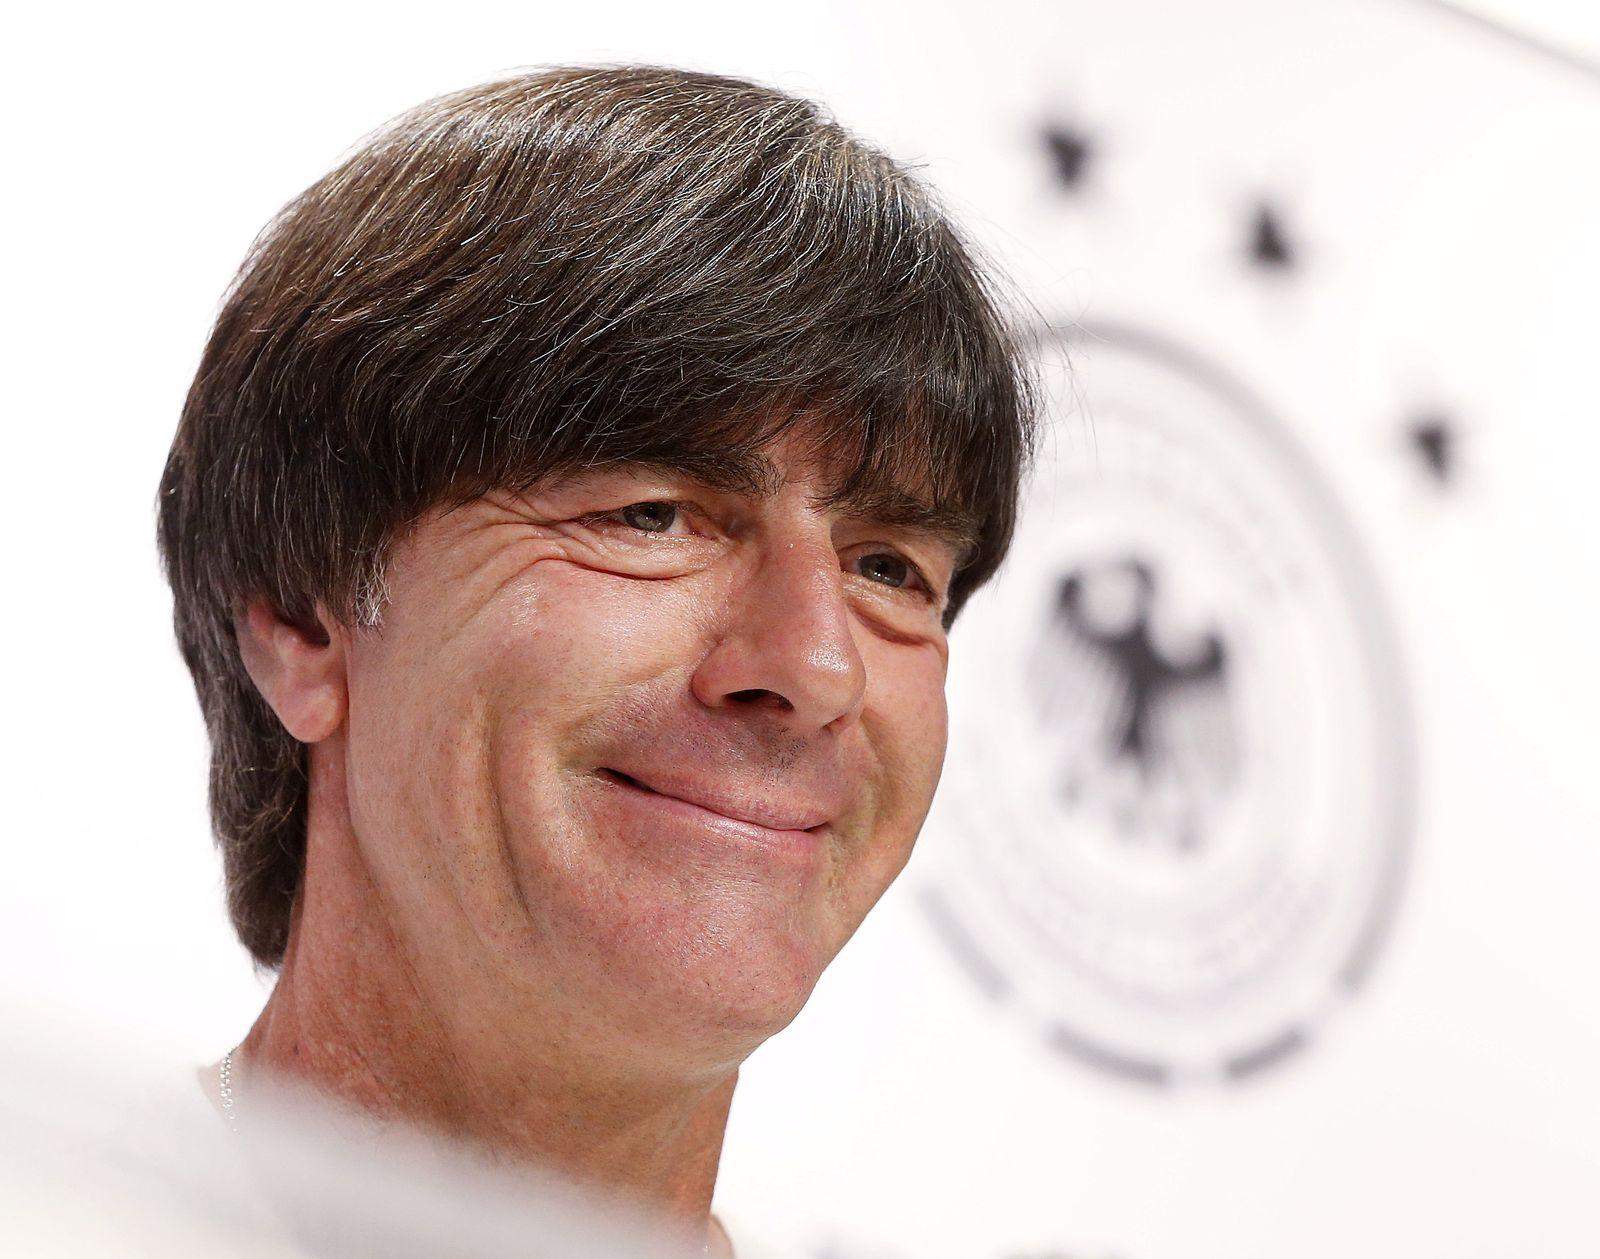 Soccer Euro 2016 Germany